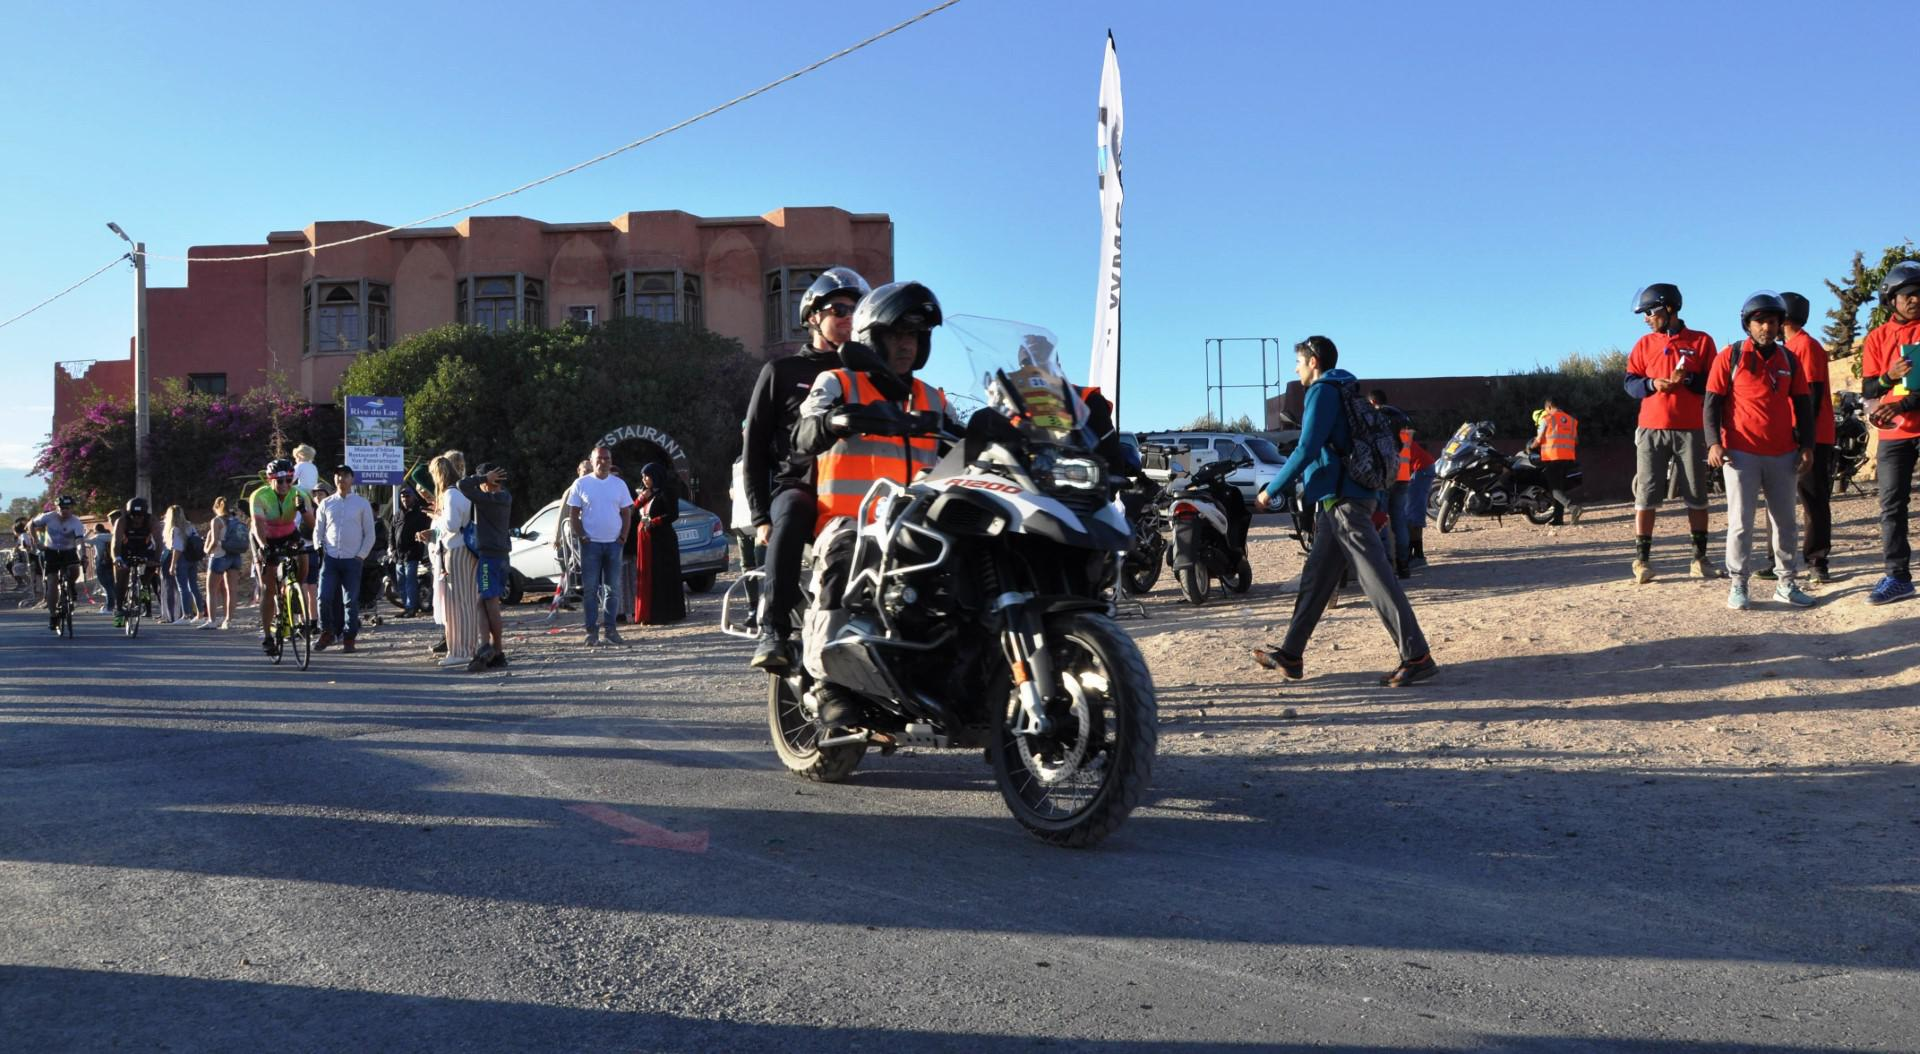 bwm-motorrad-morocco-iron-man-morocco-1143-4.jpg